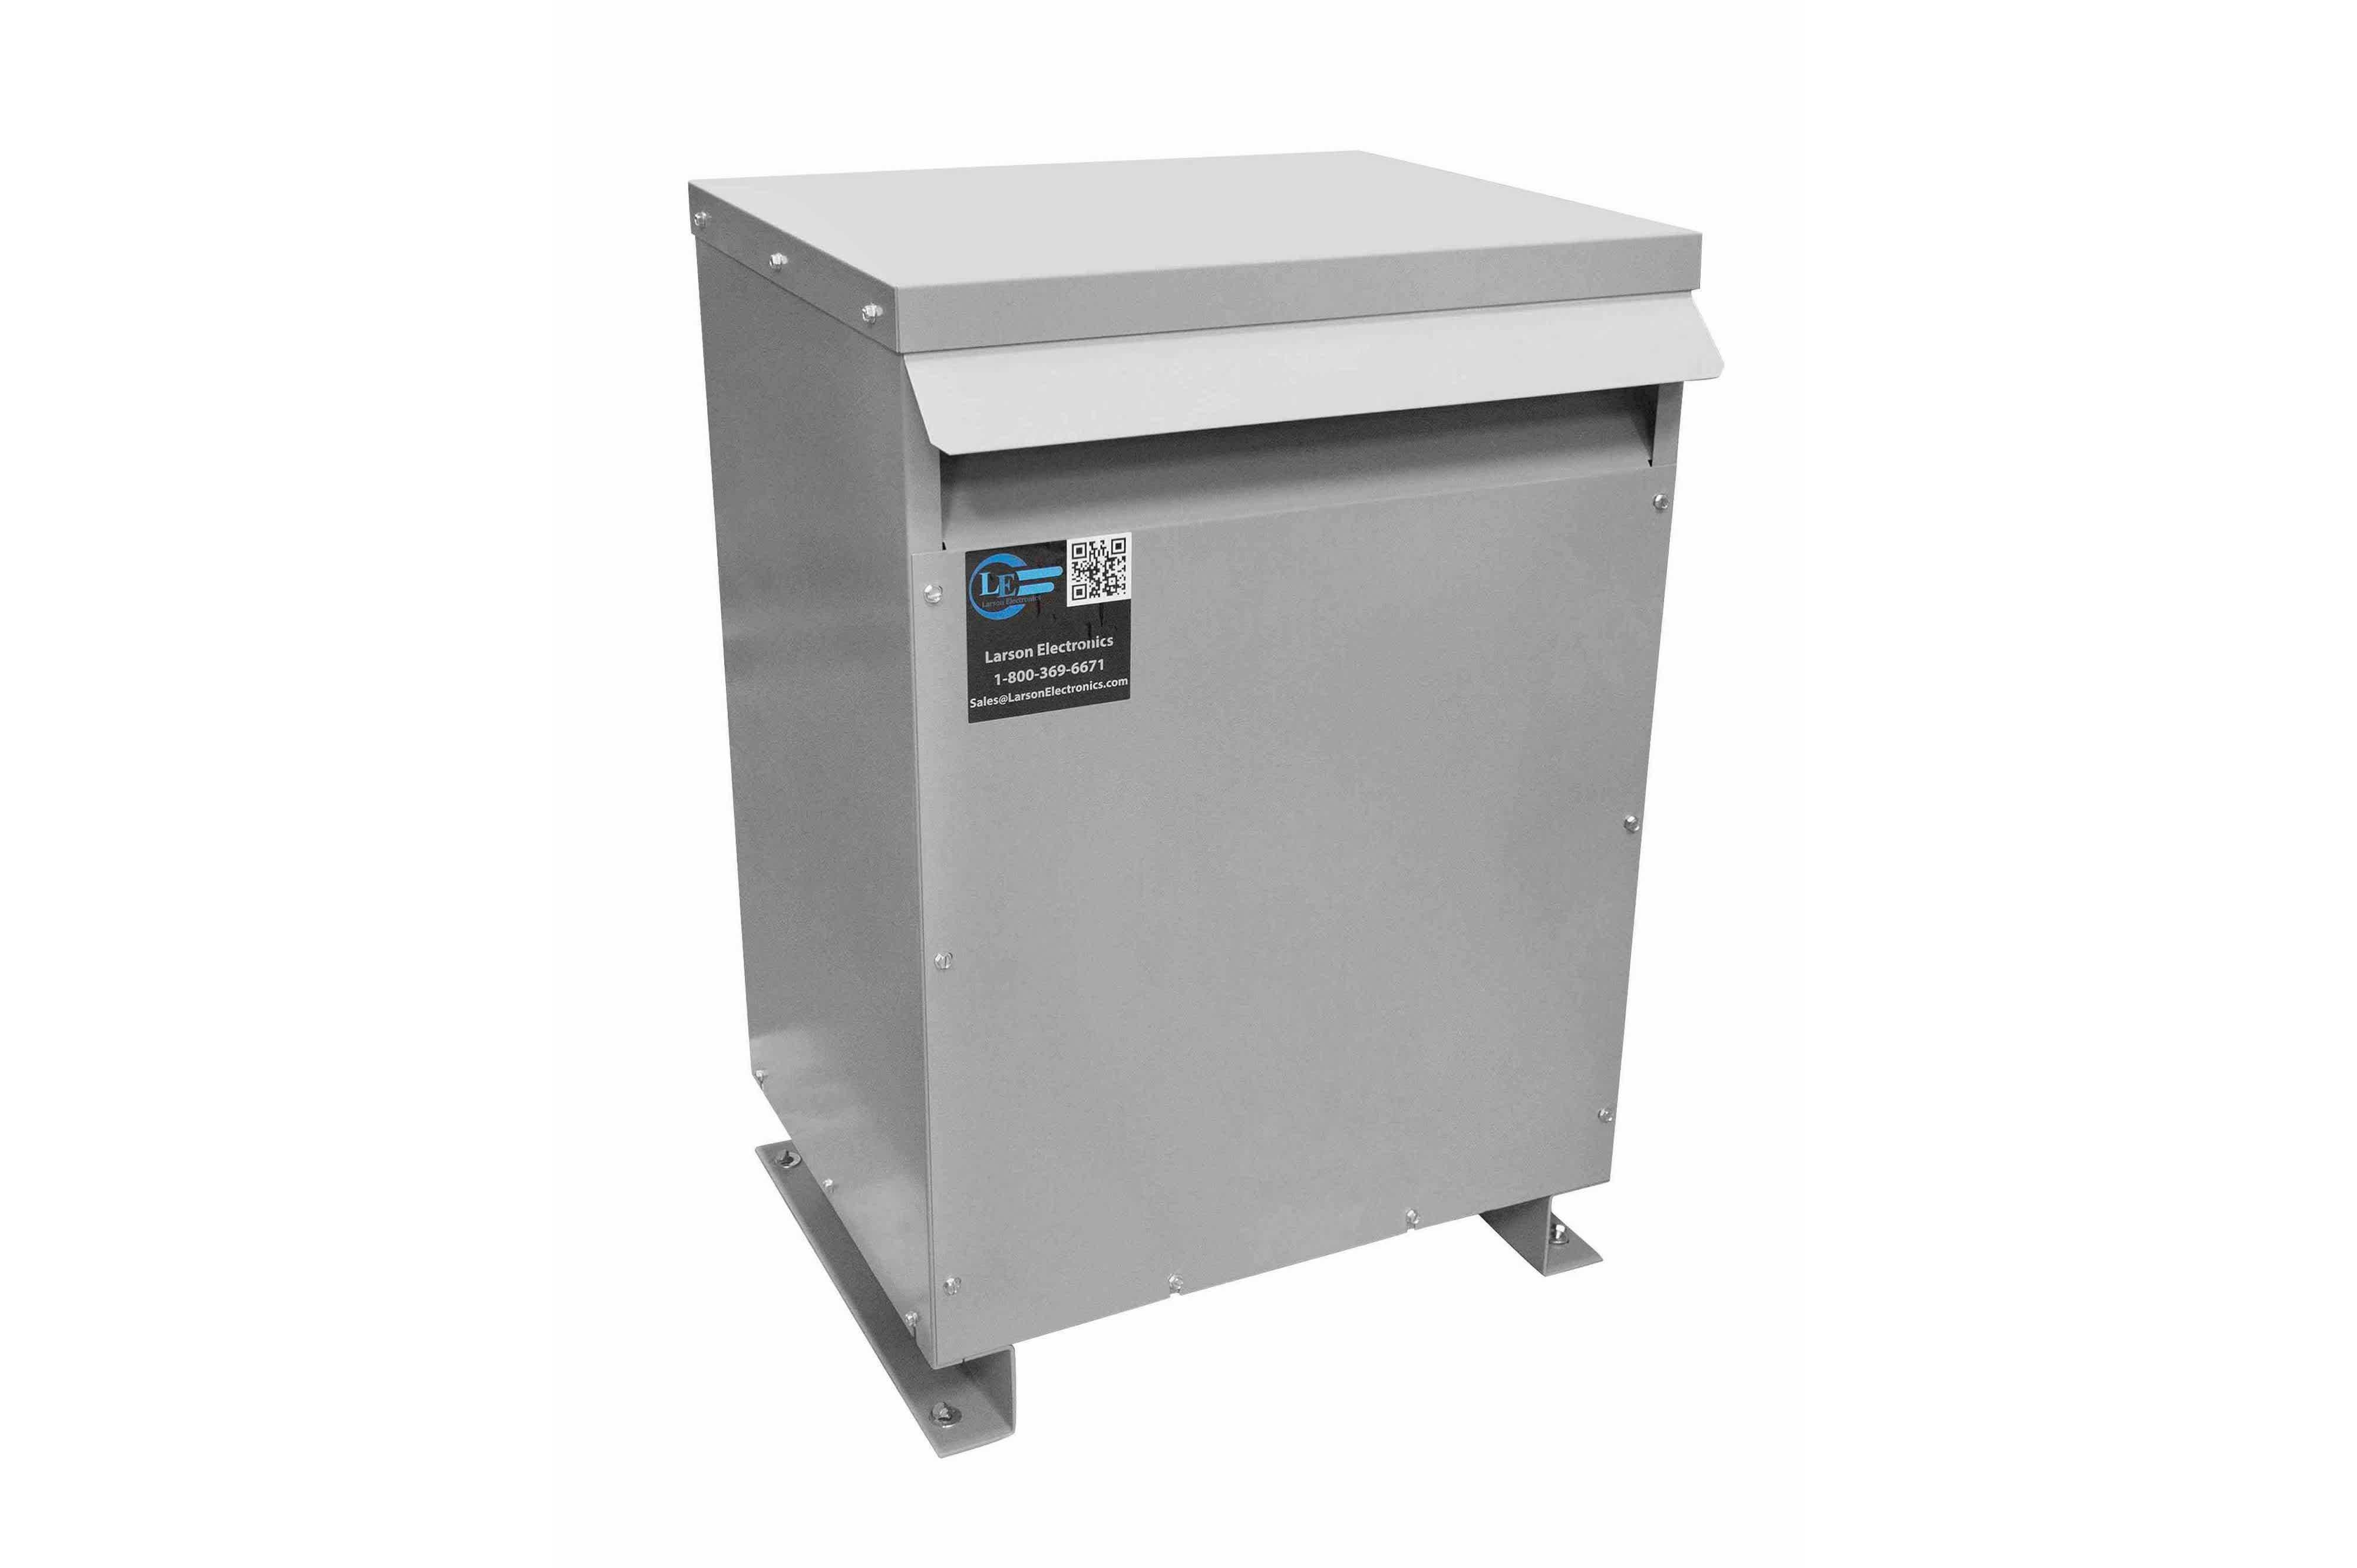 32.5 kVA 3PH Isolation Transformer, 480V Wye Primary, 208Y/120 Wye-N Secondary, N3R, Ventilated, 60 Hz